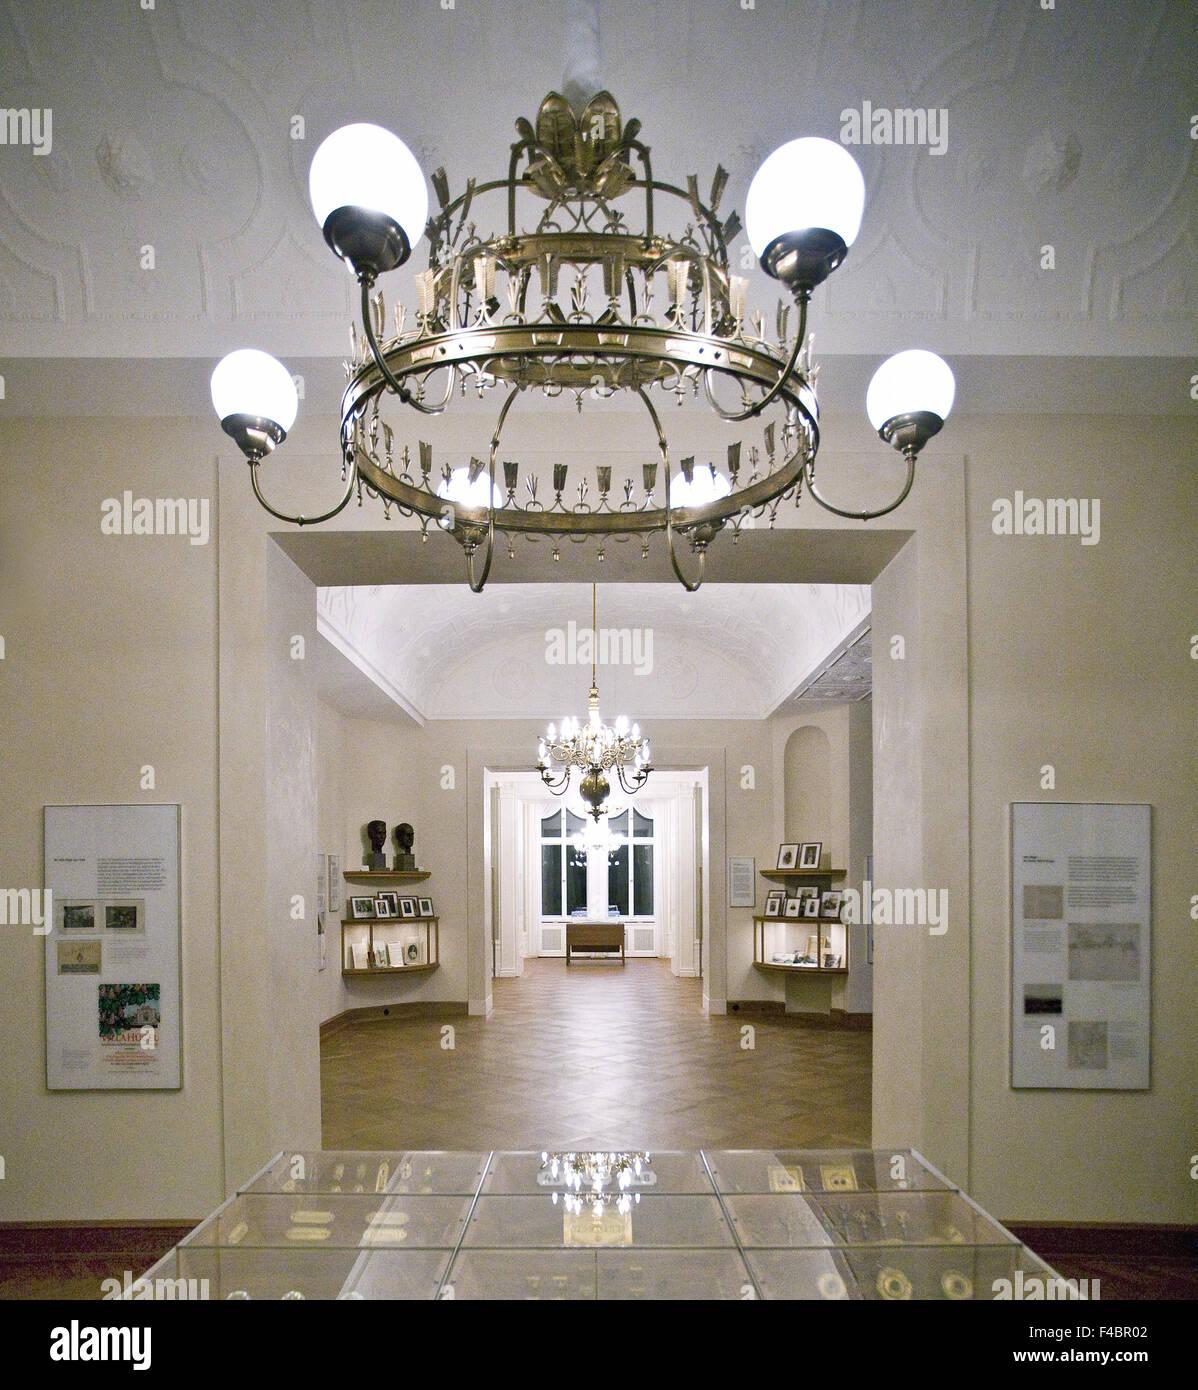 villa huegel essen germany stock photo 88769970 alamy. Black Bedroom Furniture Sets. Home Design Ideas